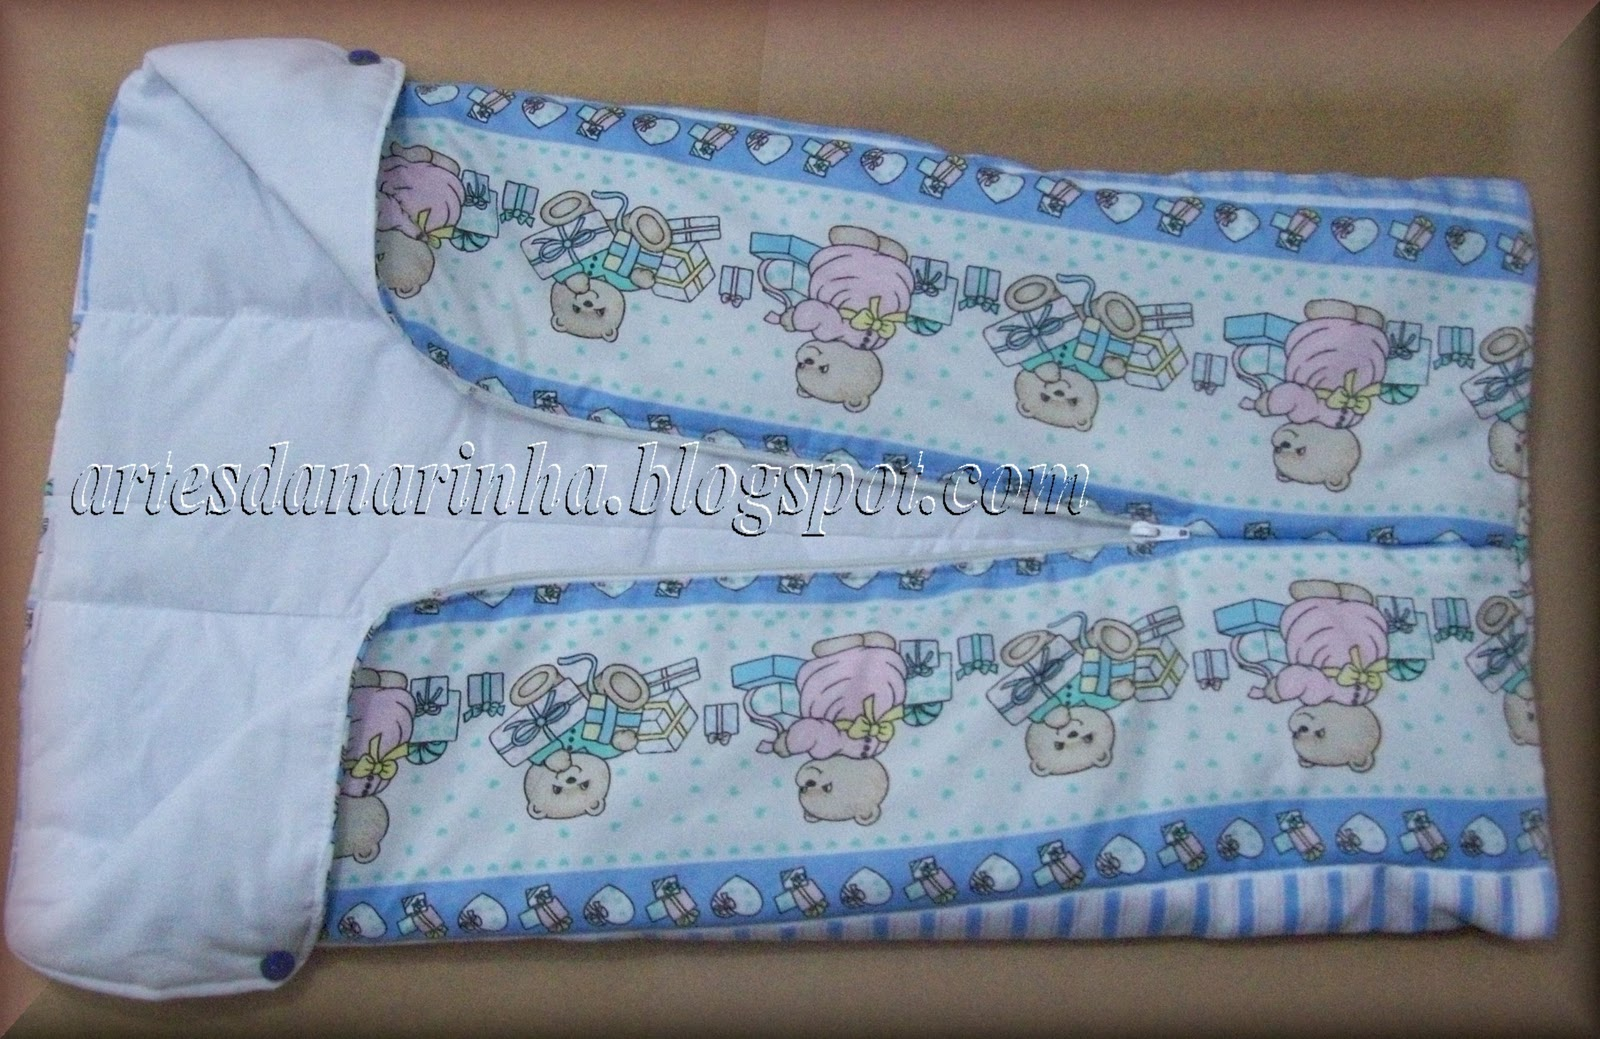 Artes da narinha porta beb saco de dormir para beb - Sacos para portabebes ...